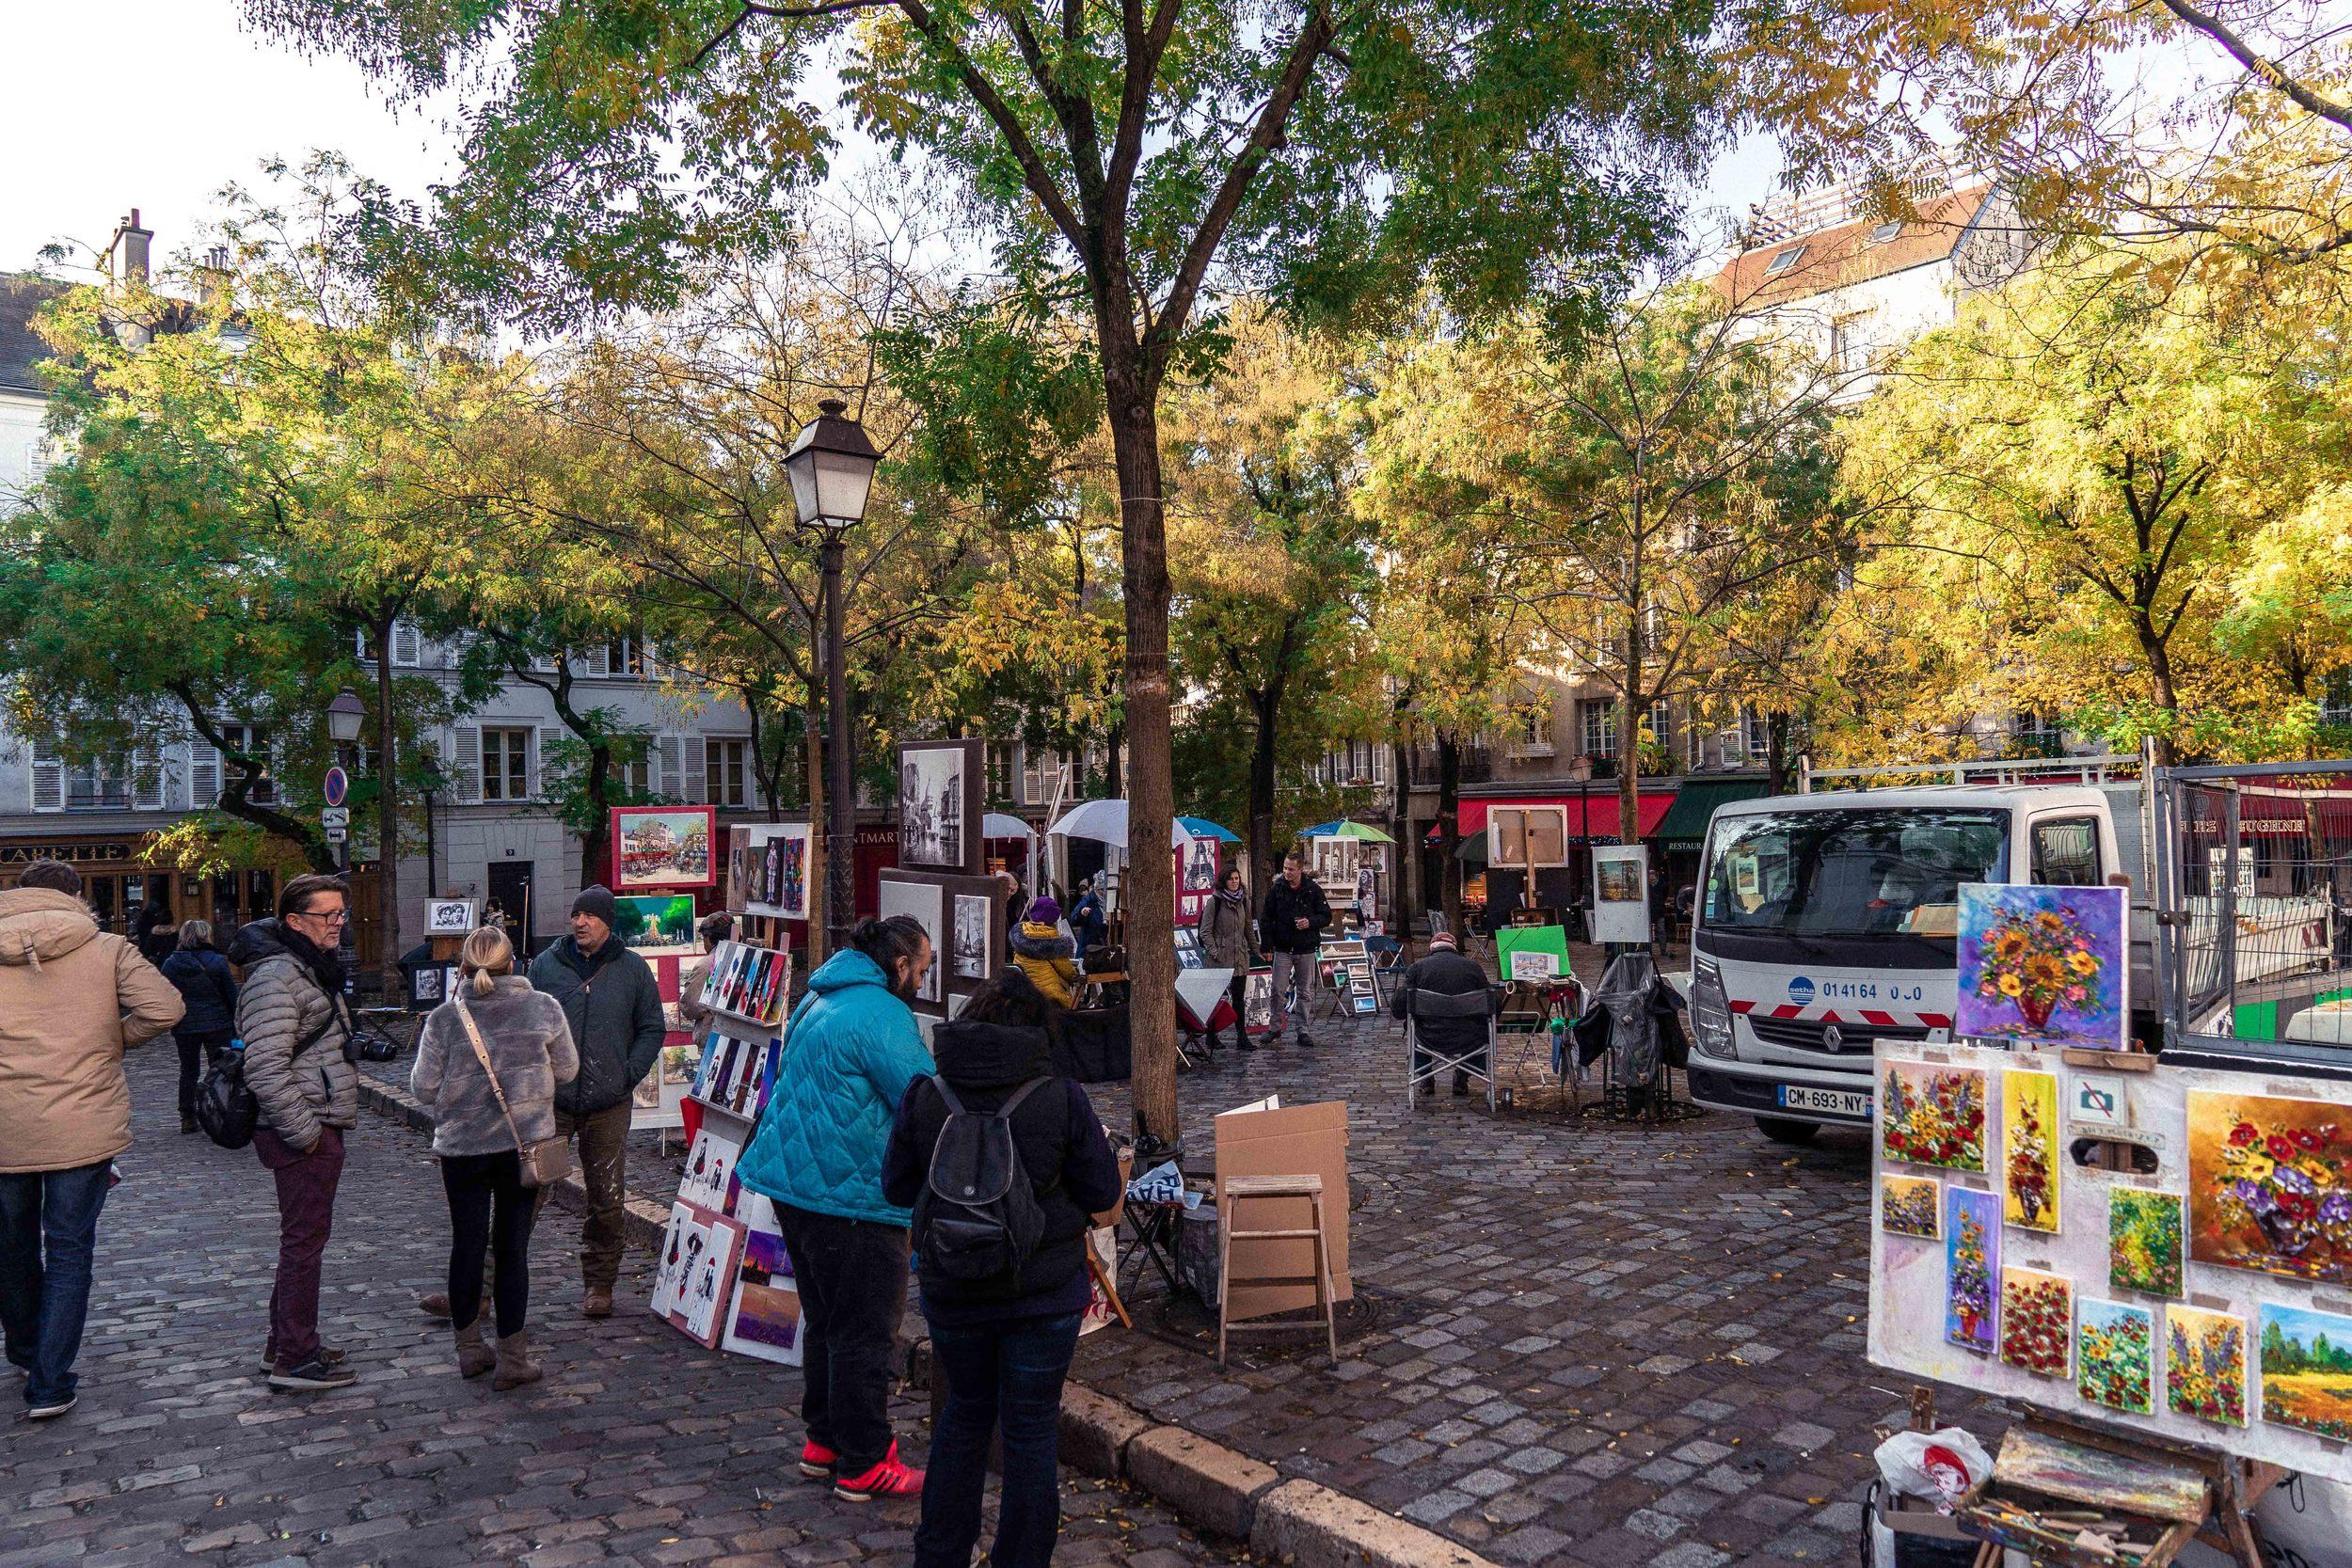 watch the artists painting en plein air in Place du Tertre, Montmartre